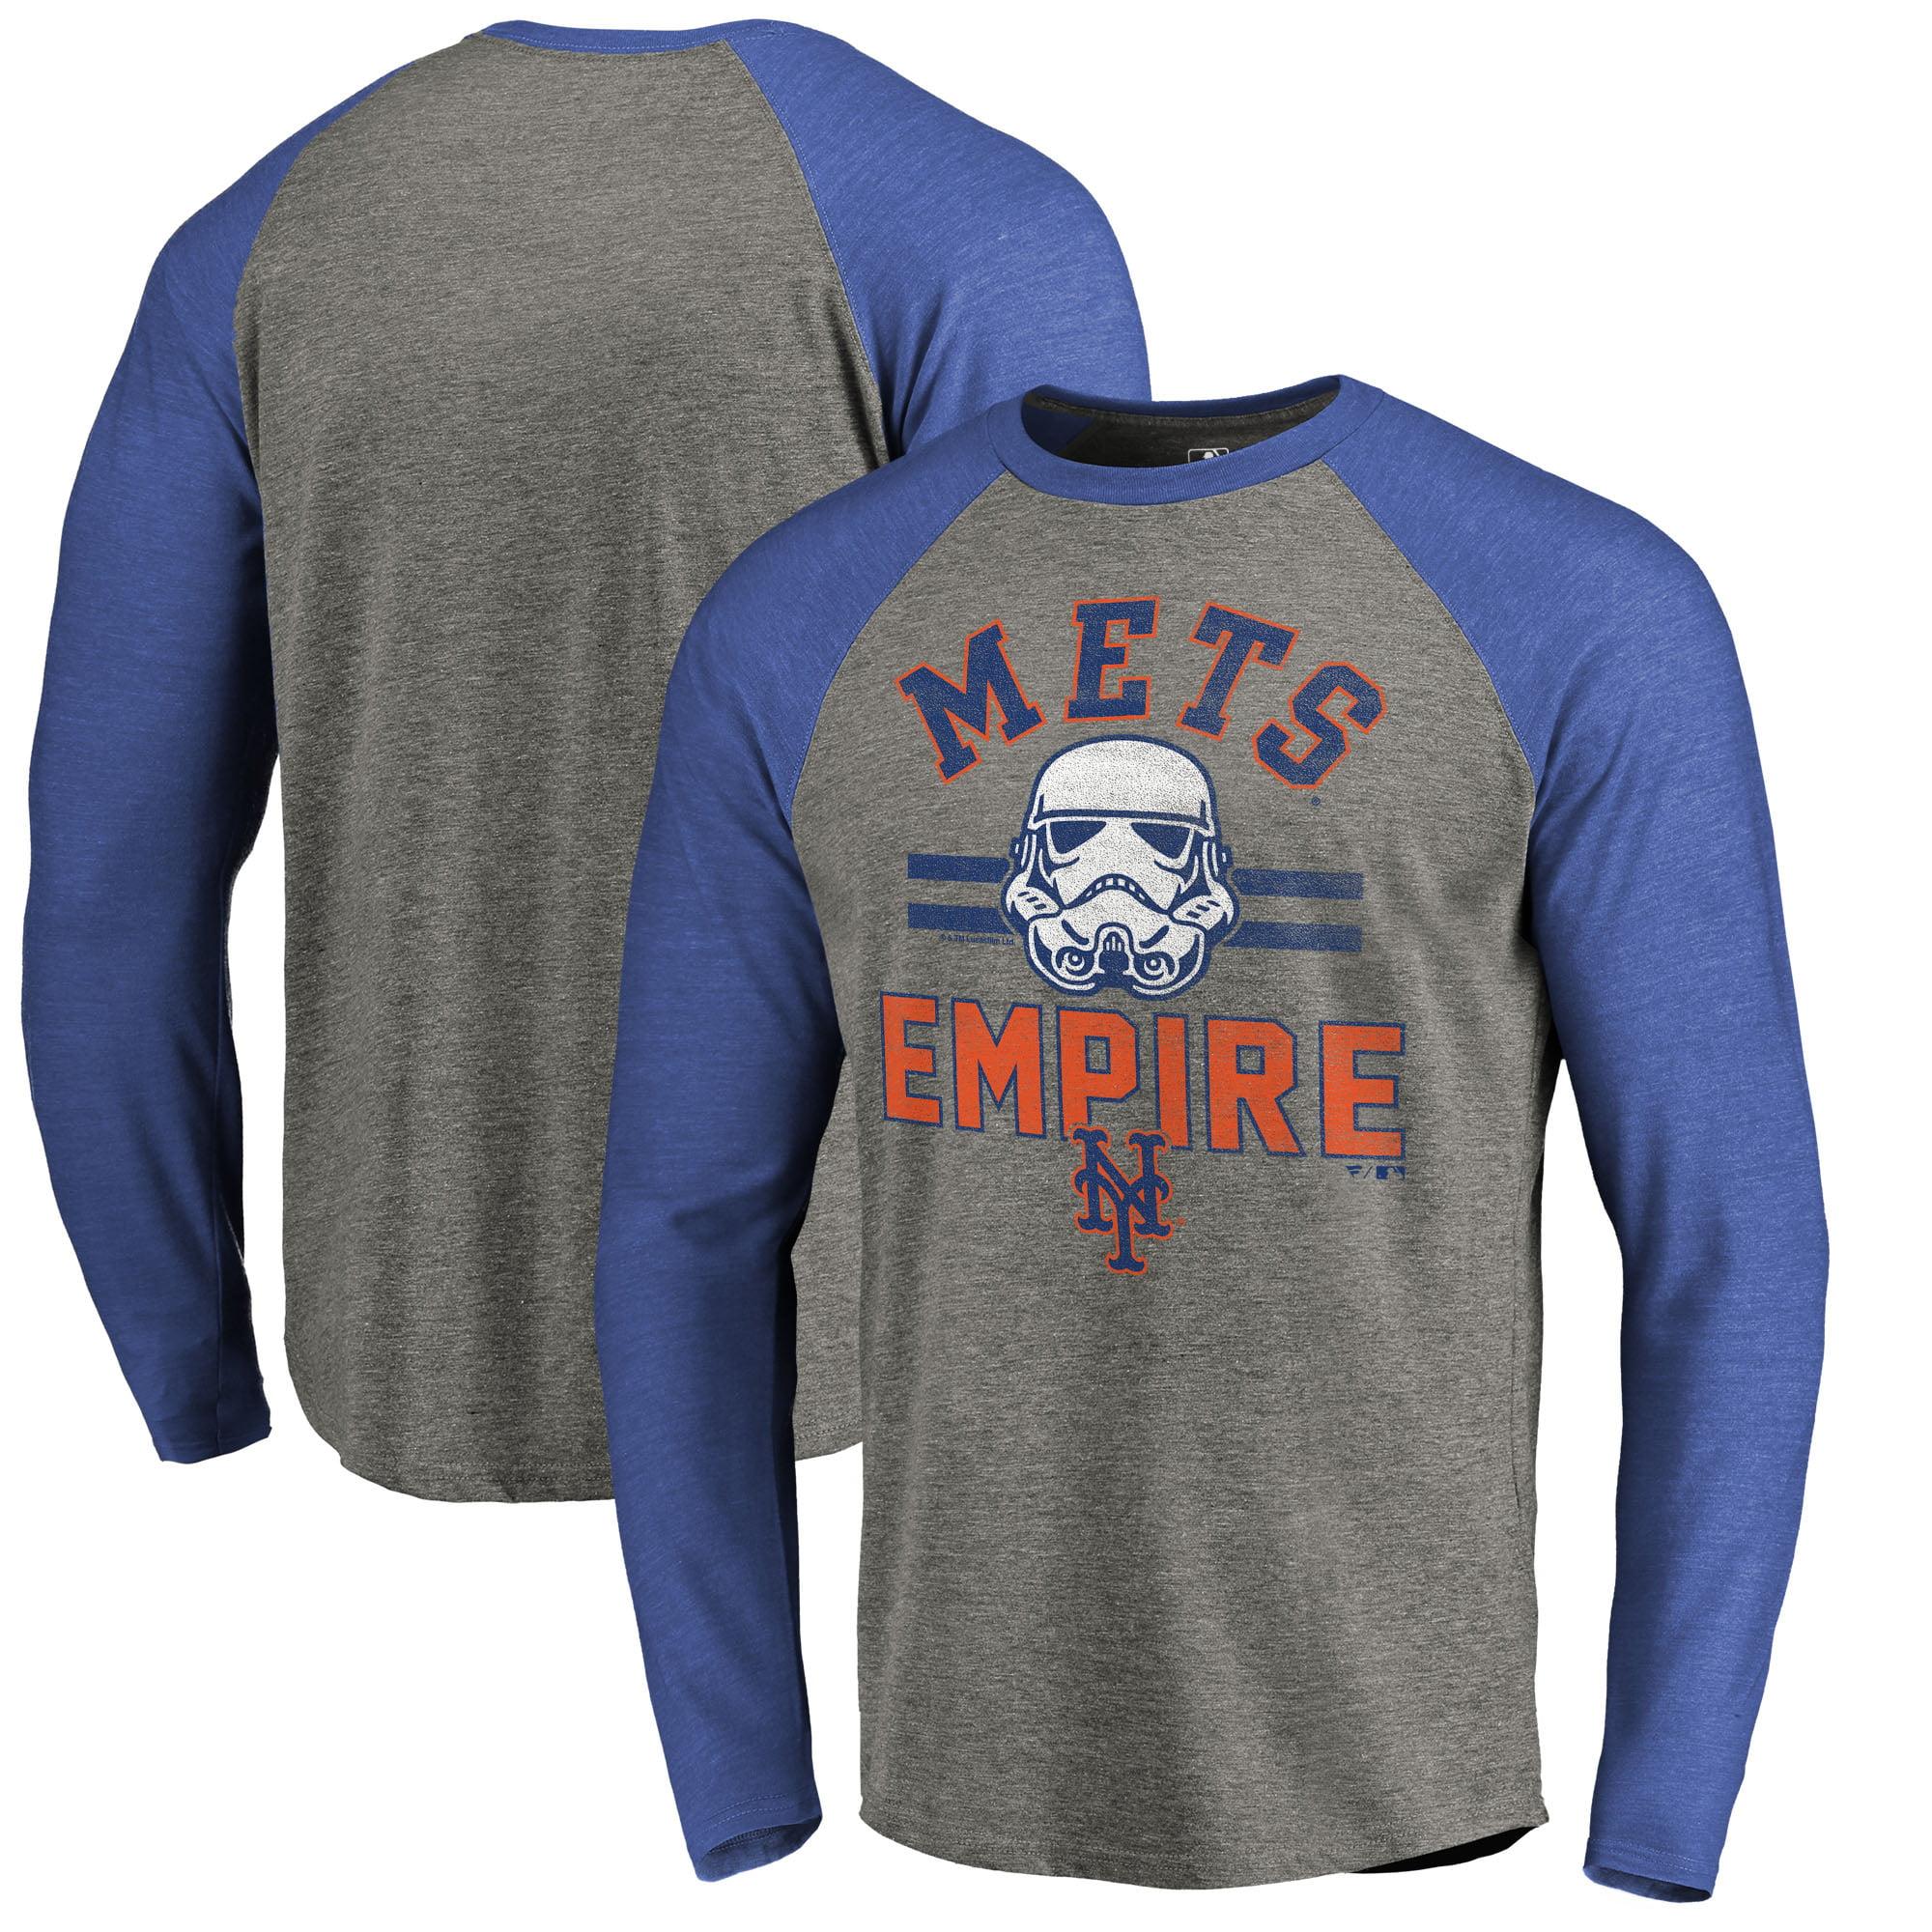 New York Mets Fanatics Branded MLB Star Wars Empire Raglan Long Sleeve T-Shirt - Heather Gray